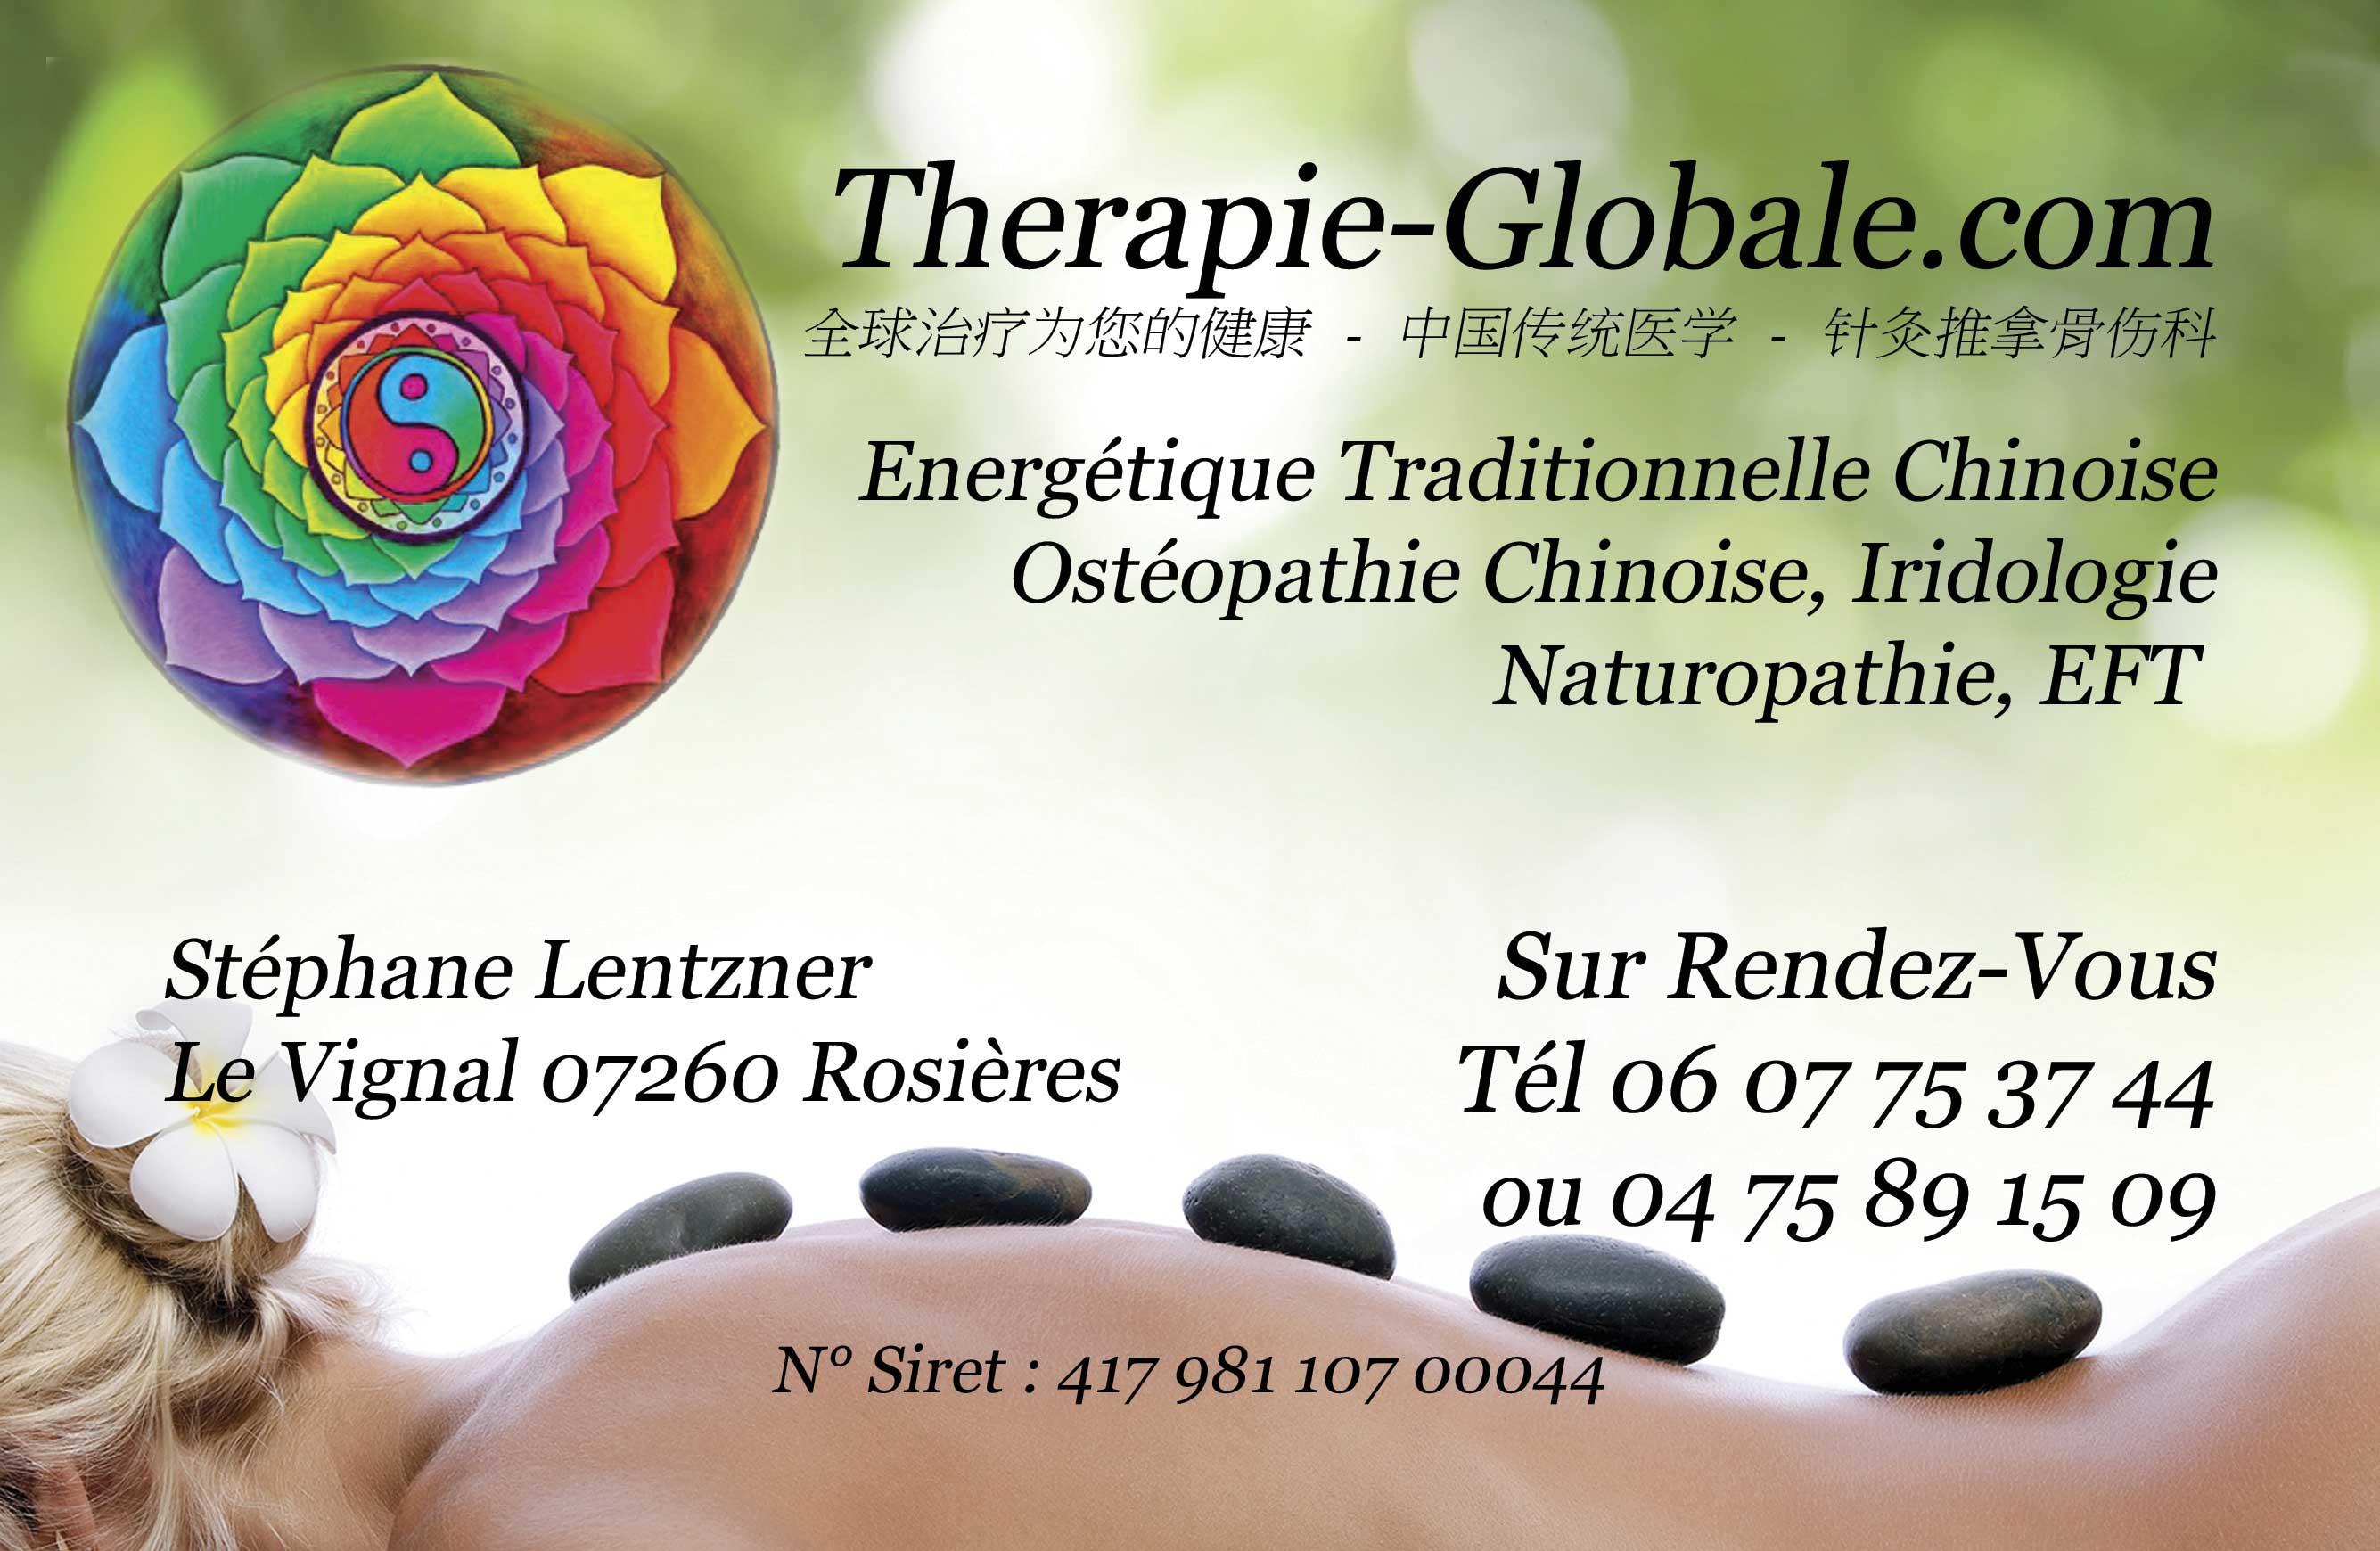 Praticien Naturopathe Thrapeute En Naturopathie EFT Ostopathie Chinoise Et Mdecine